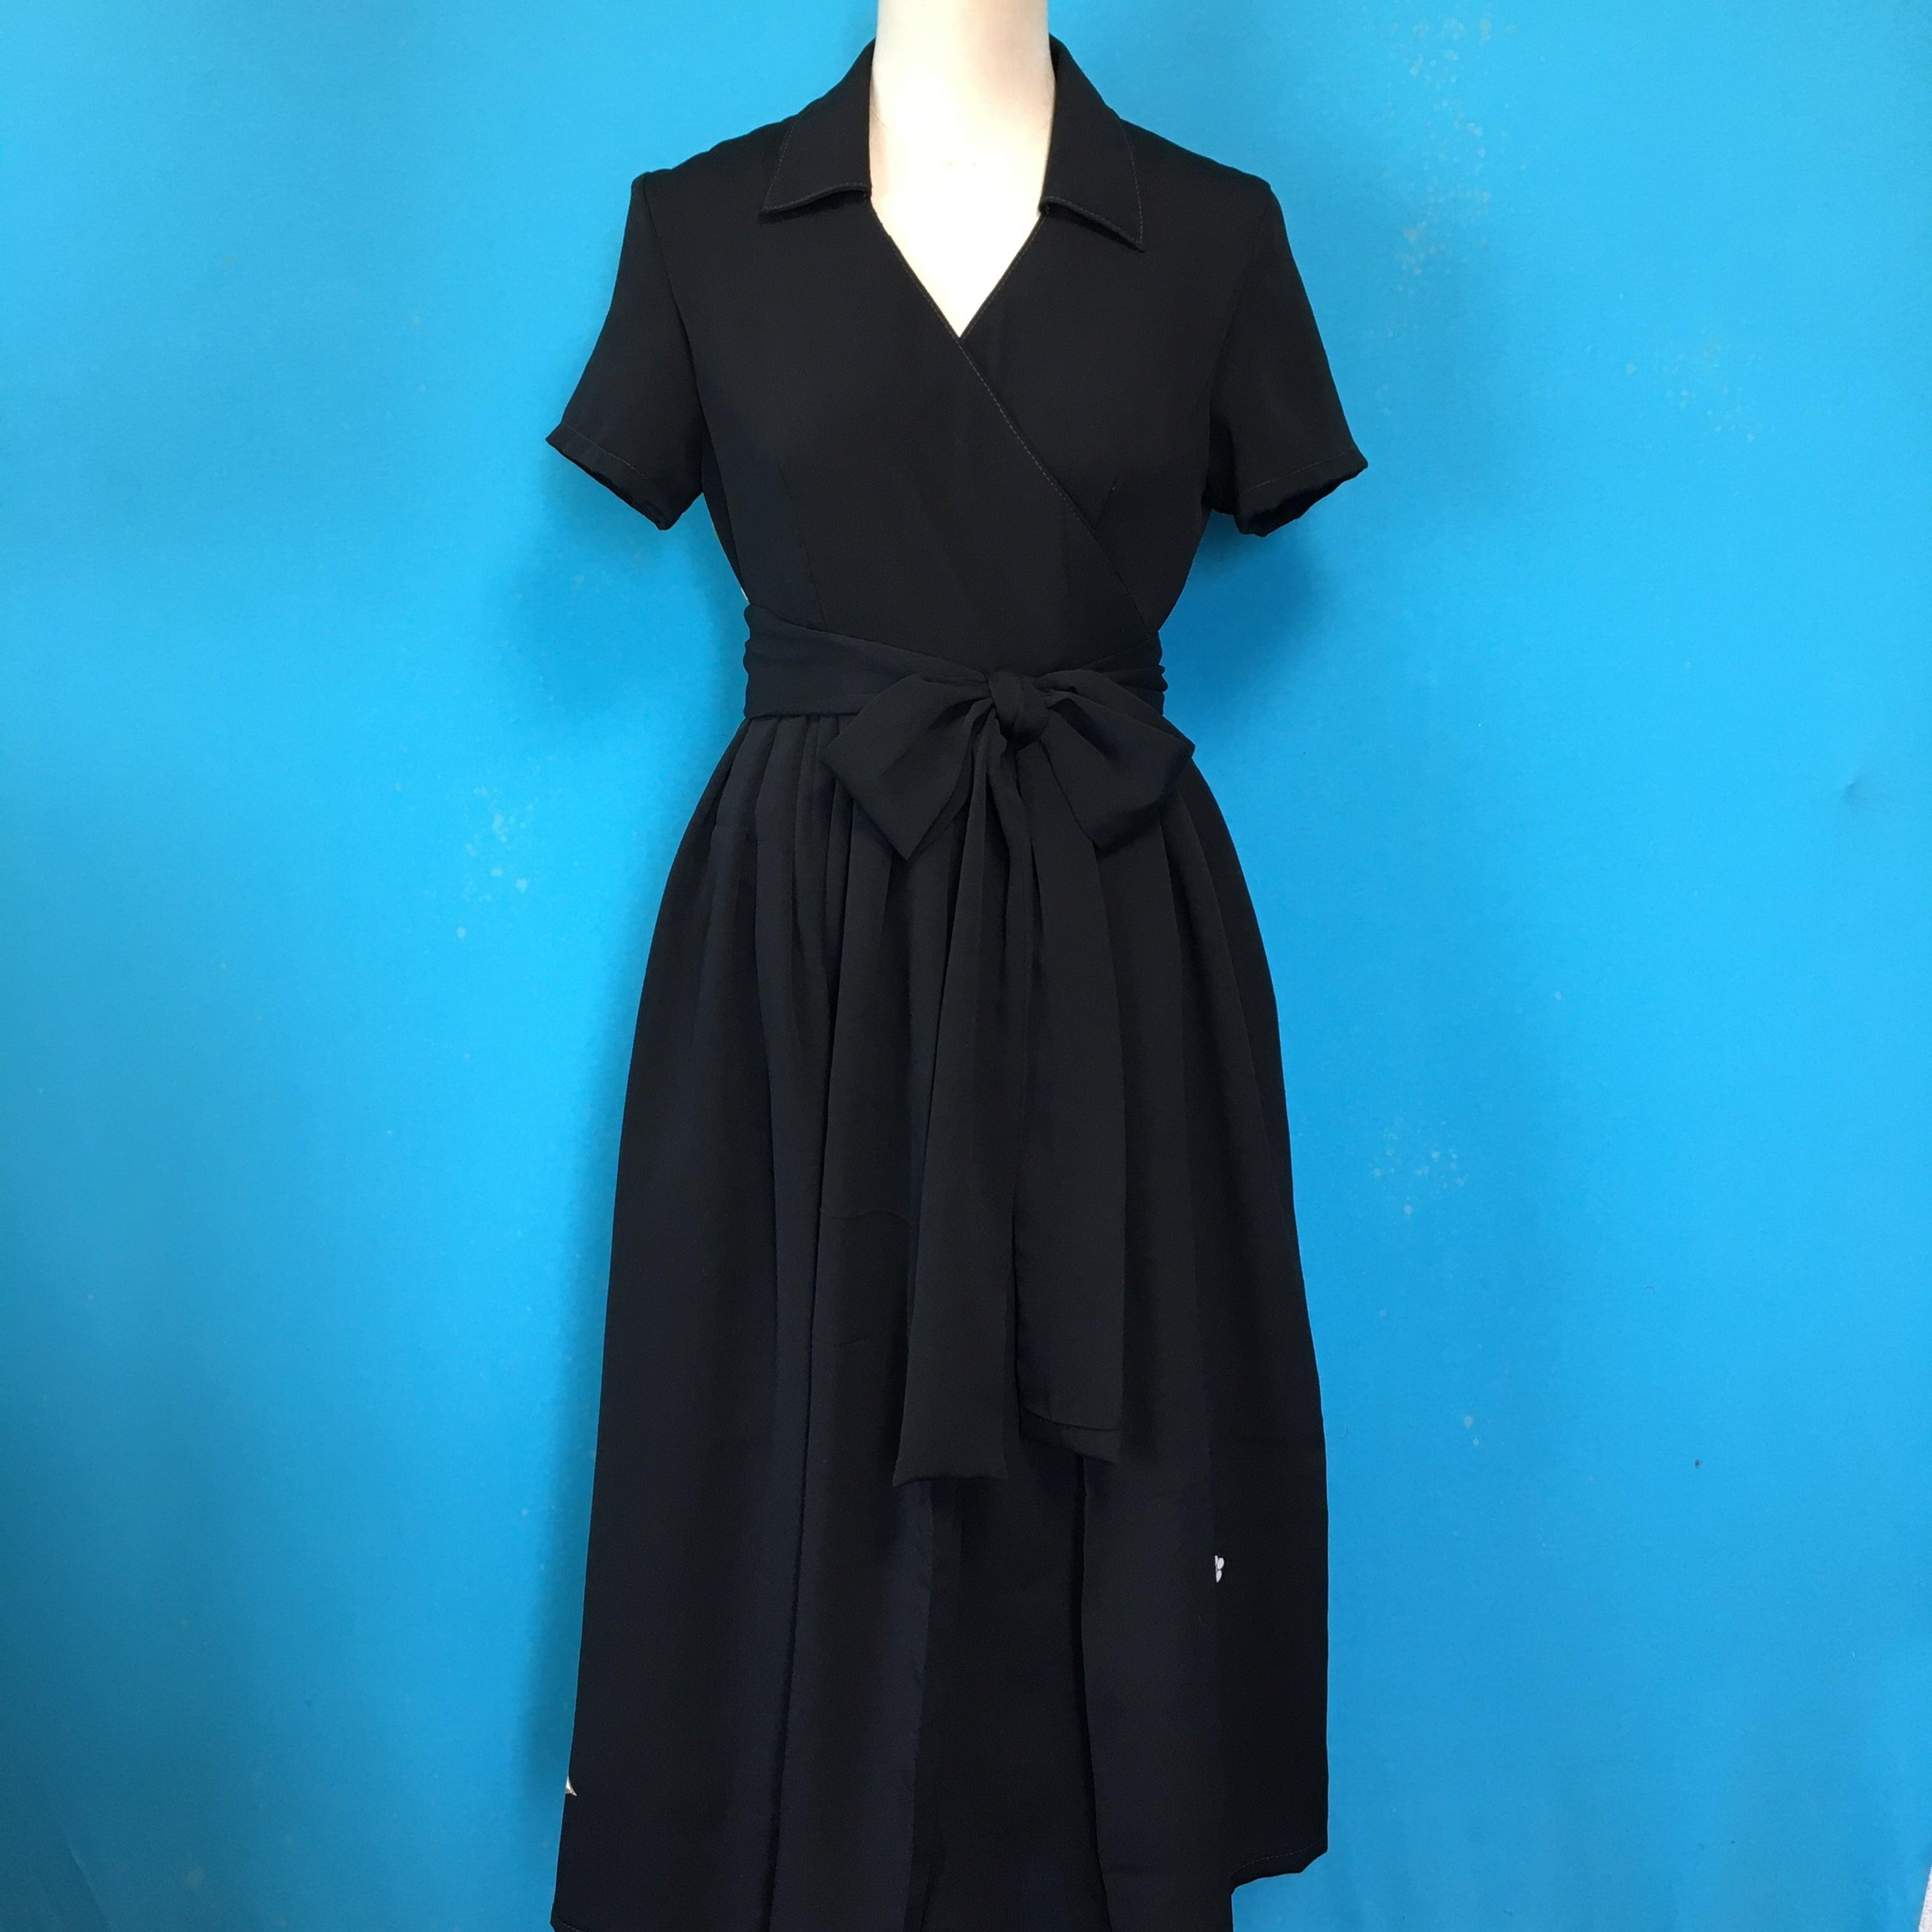 Vintage black wrap dress 刺繍 US 6